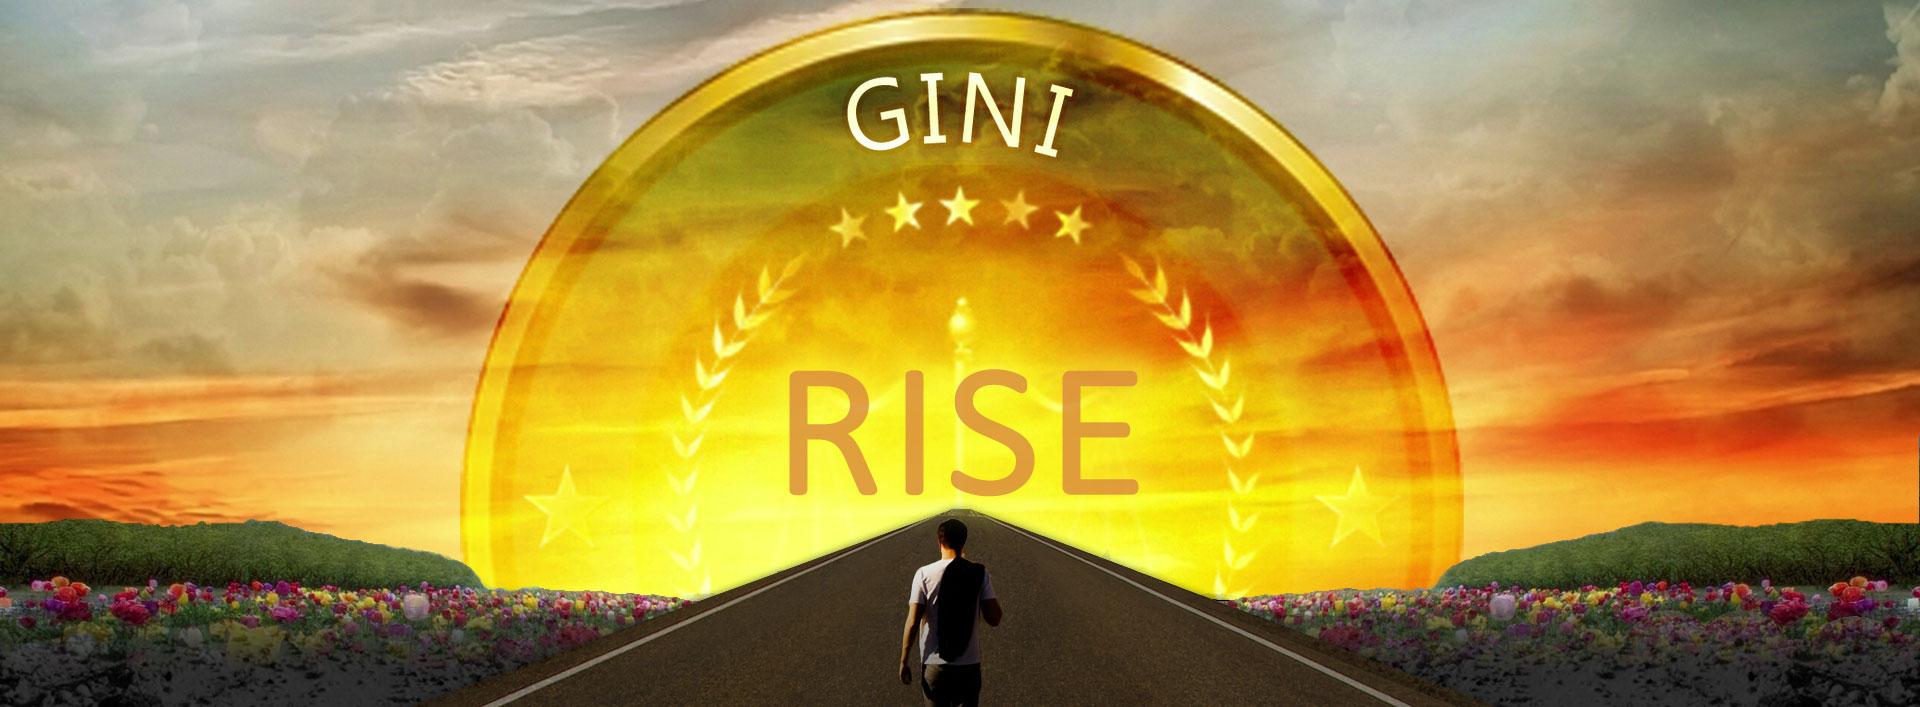 gini-rising-ginifoundation.org